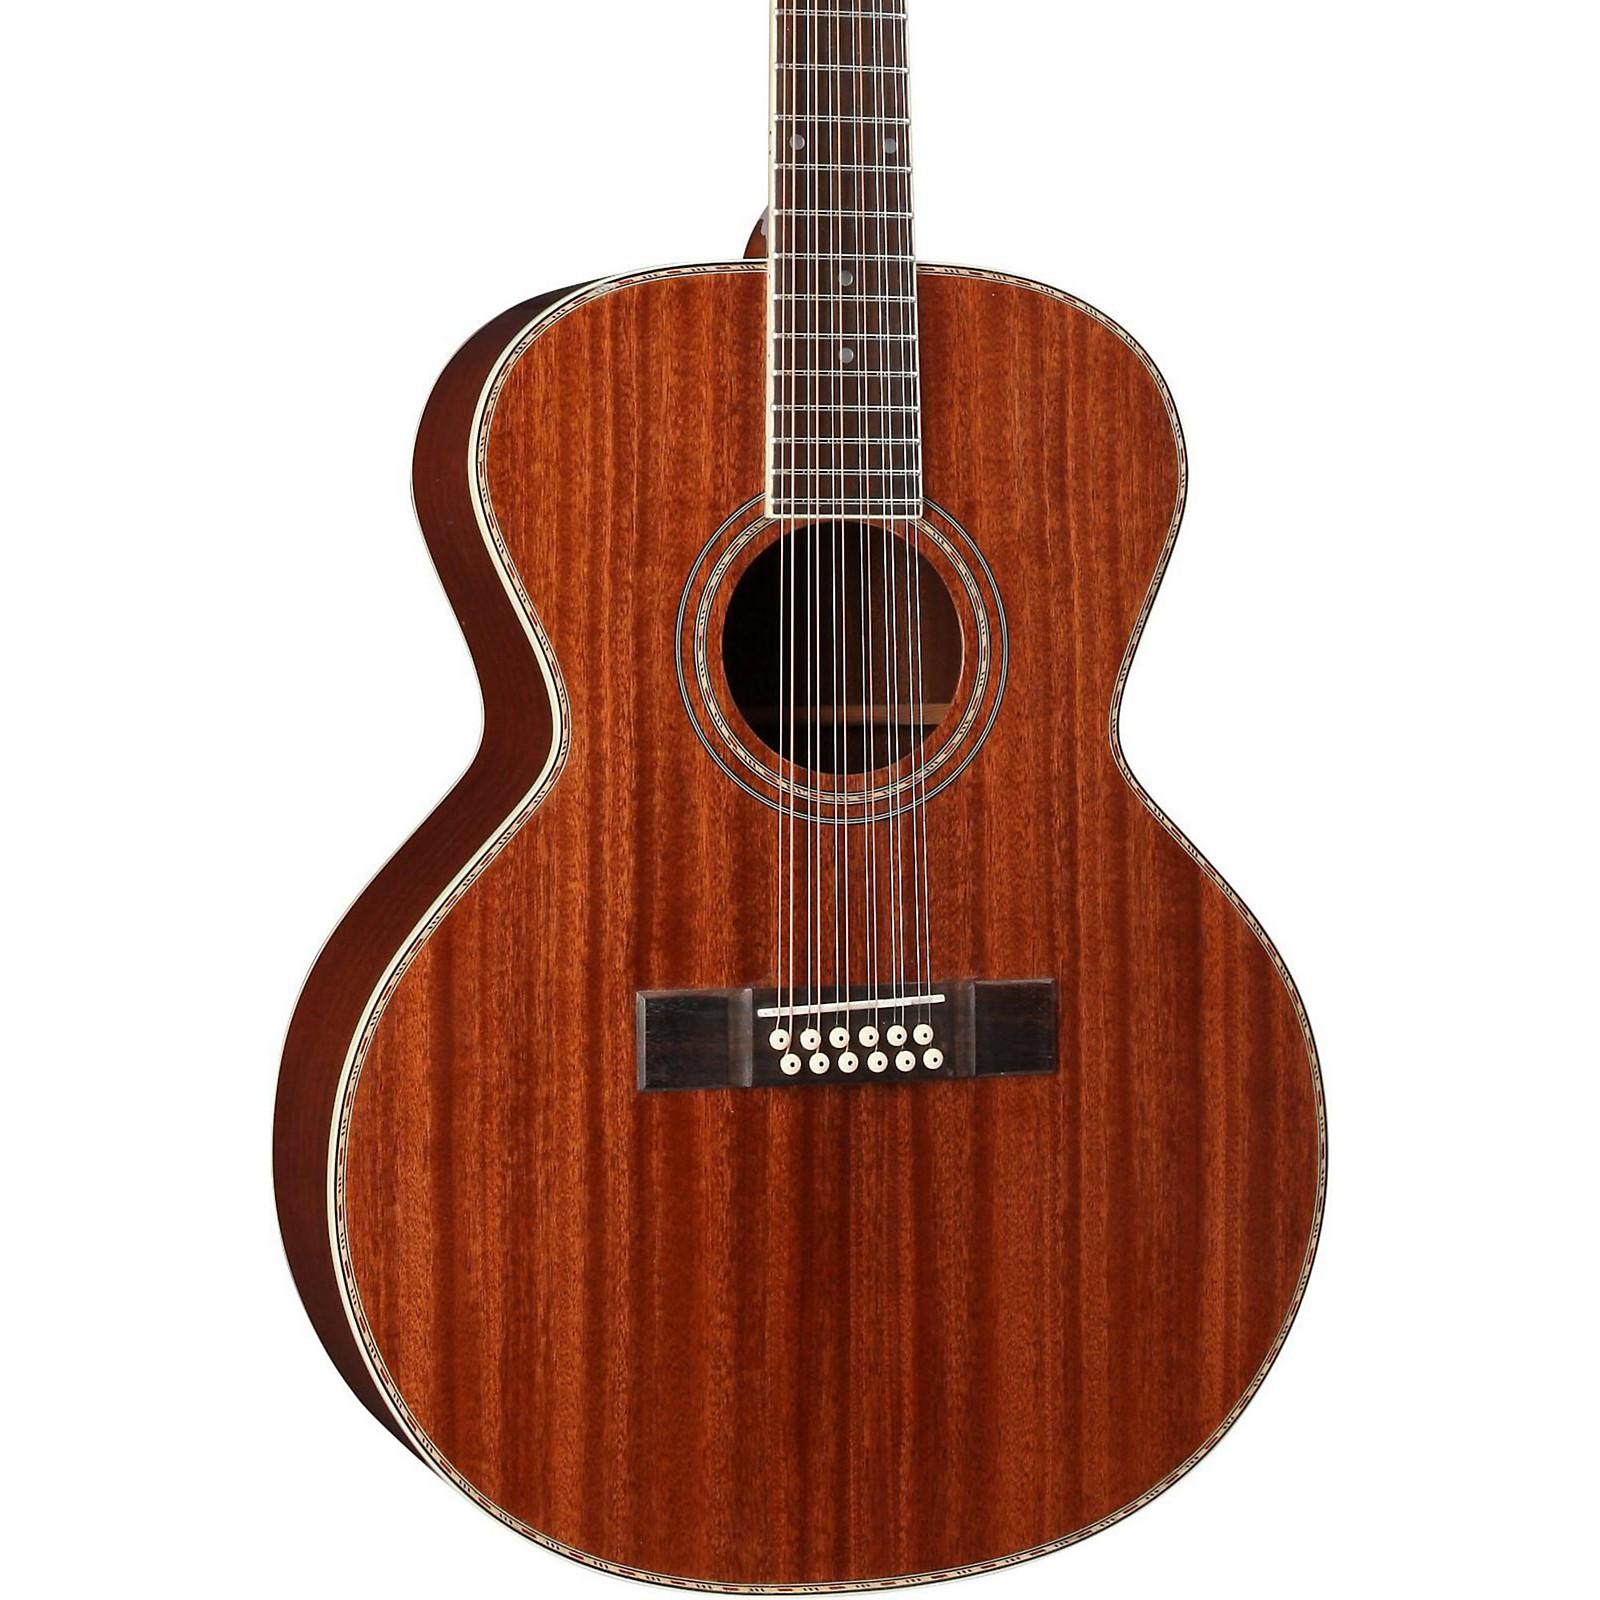 Giannini GS-1/12 WG 12-String Grand Concert Autograph Guitar